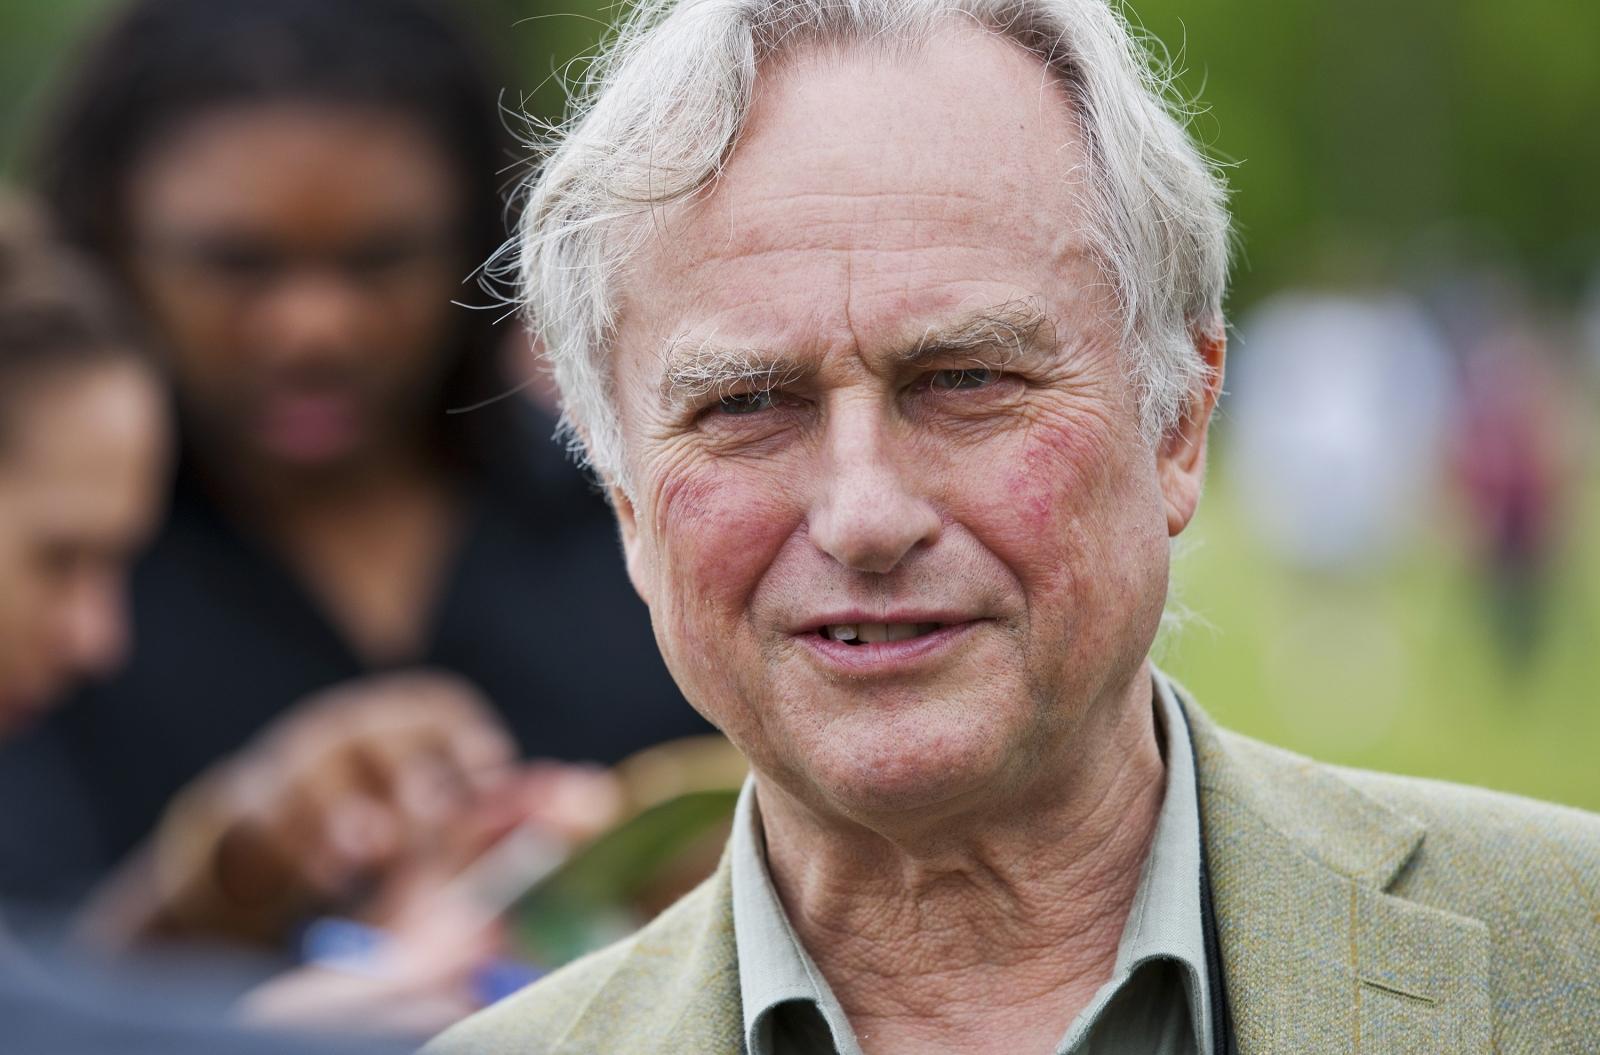 Scottish Independence: Richard Dawkins and Mick Jagger Amid 200 Public Figures Against Union Break